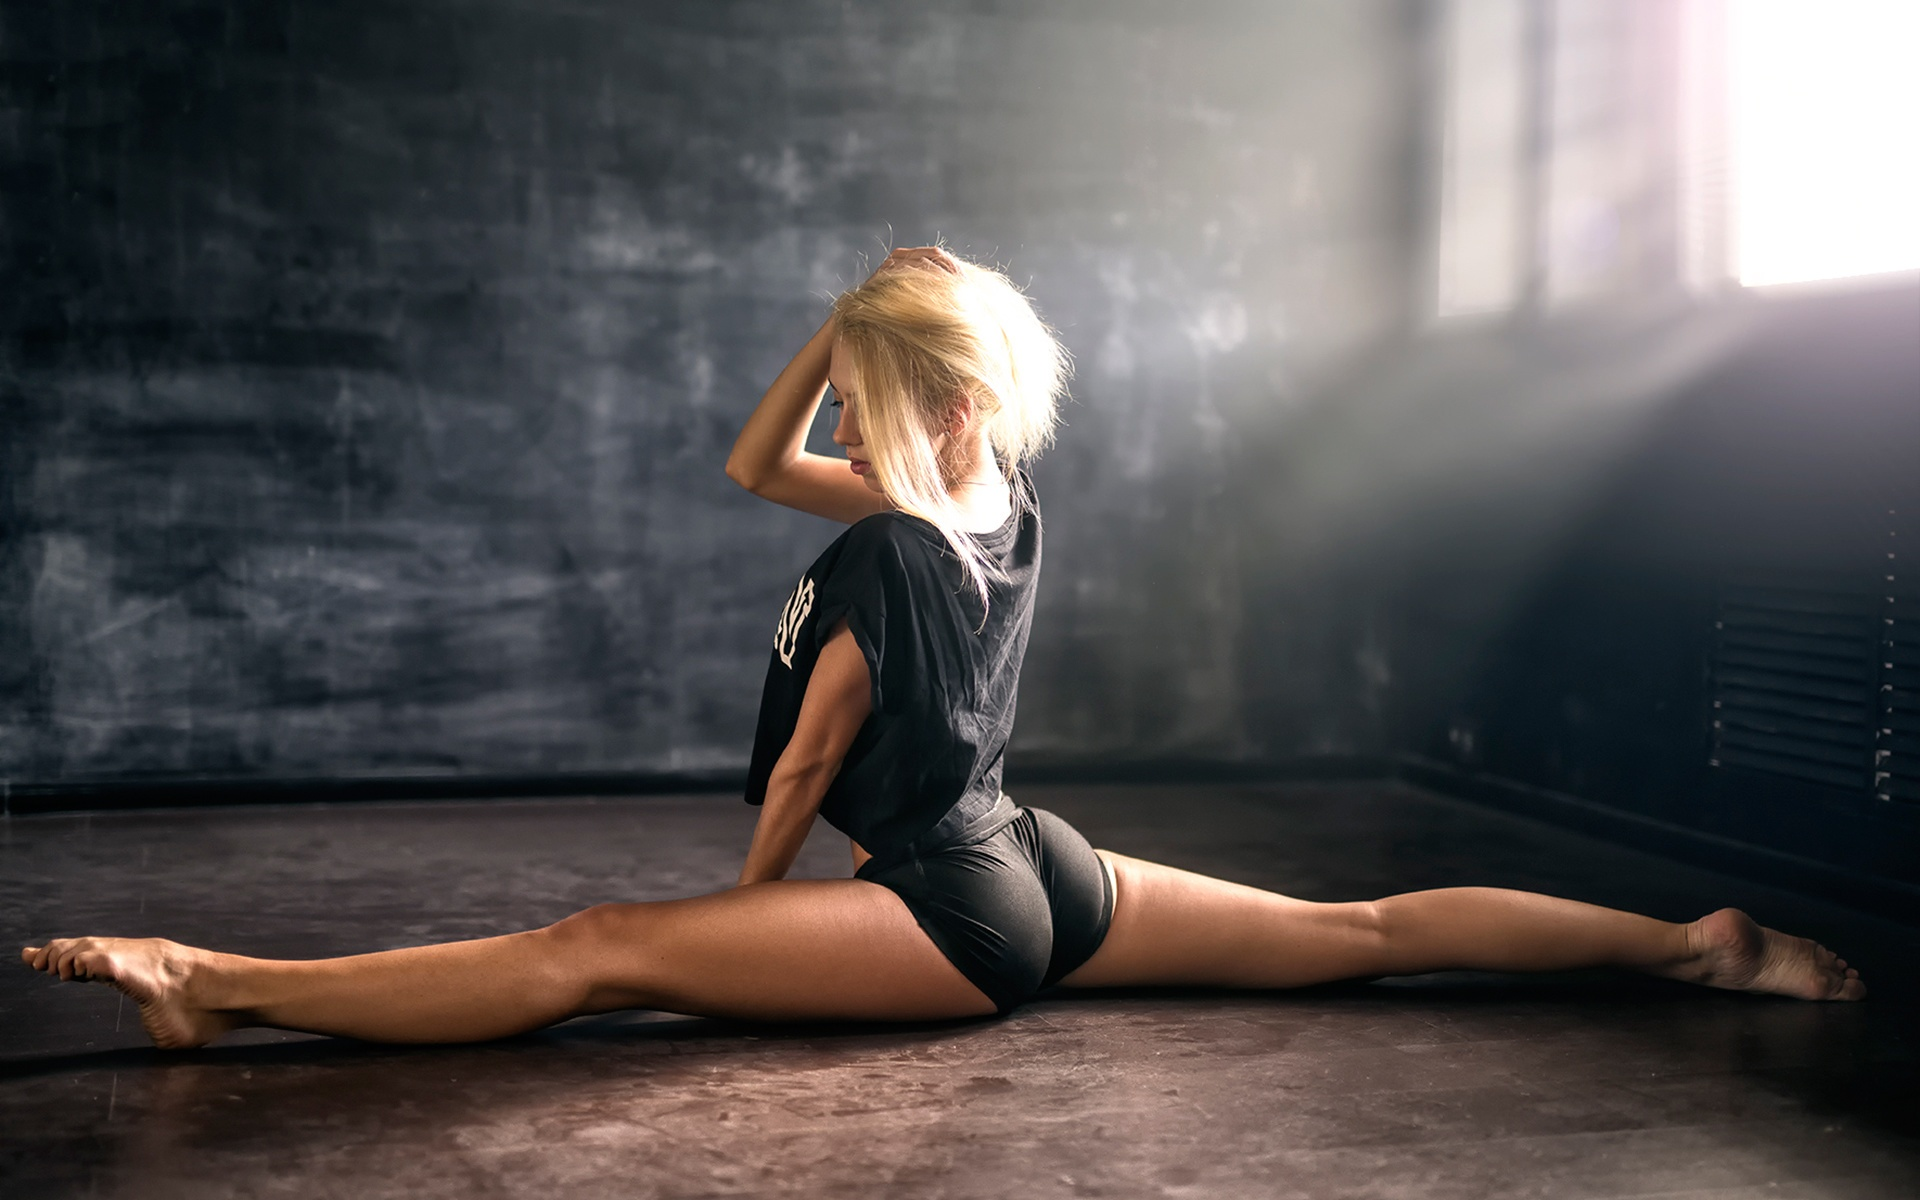 Hot Blond Dancing